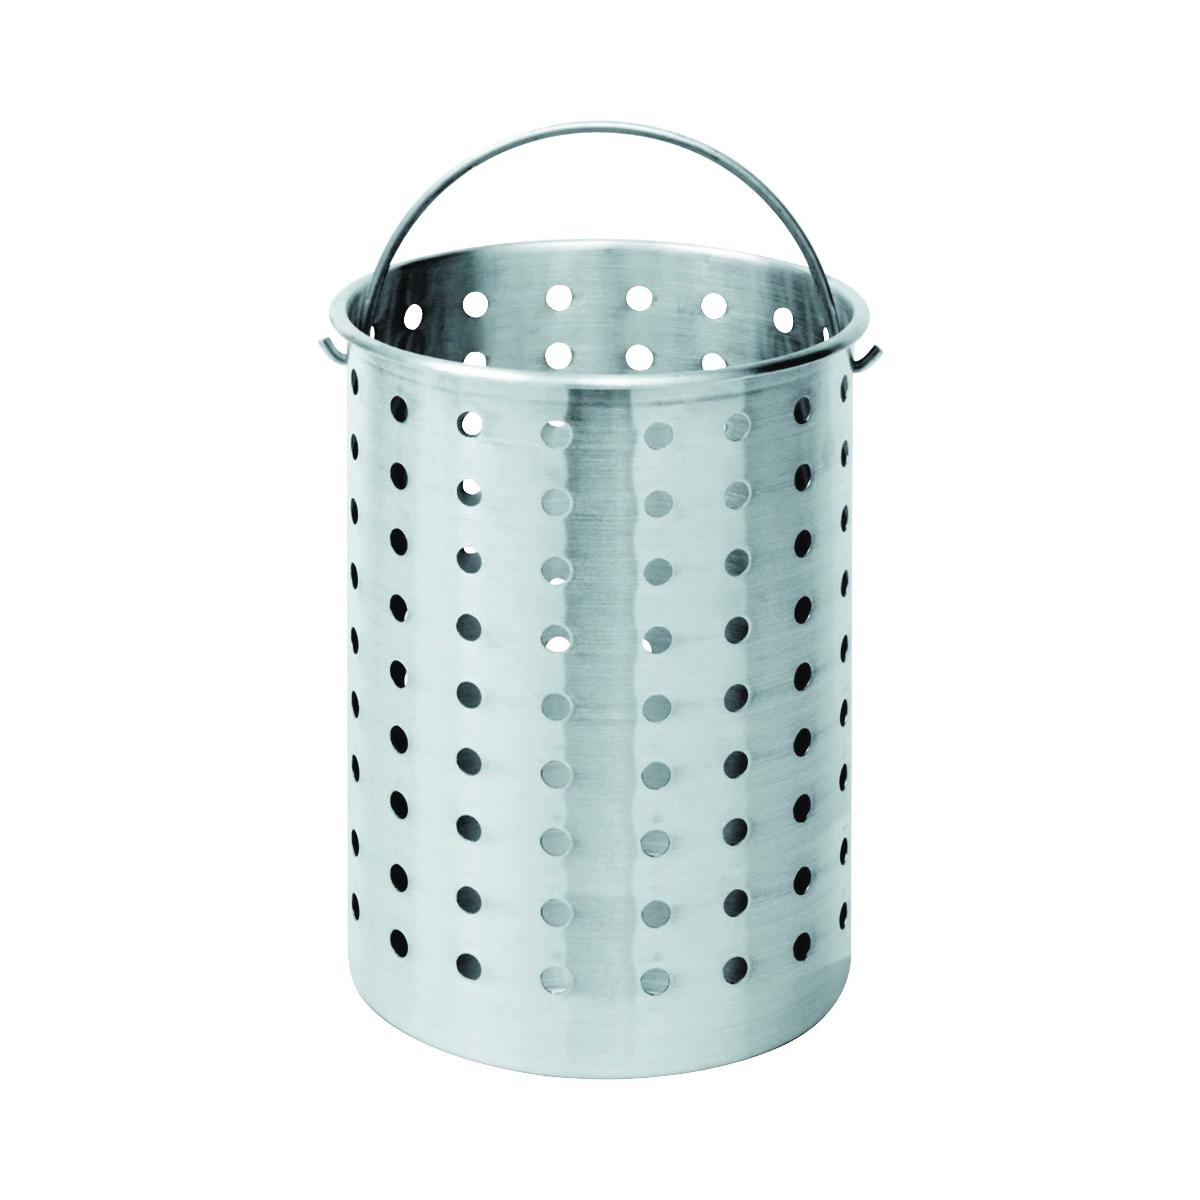 Picture of Bayou Classic B300 Fryer Basket, Aluminum, For: 30 qt Turkey Fryer